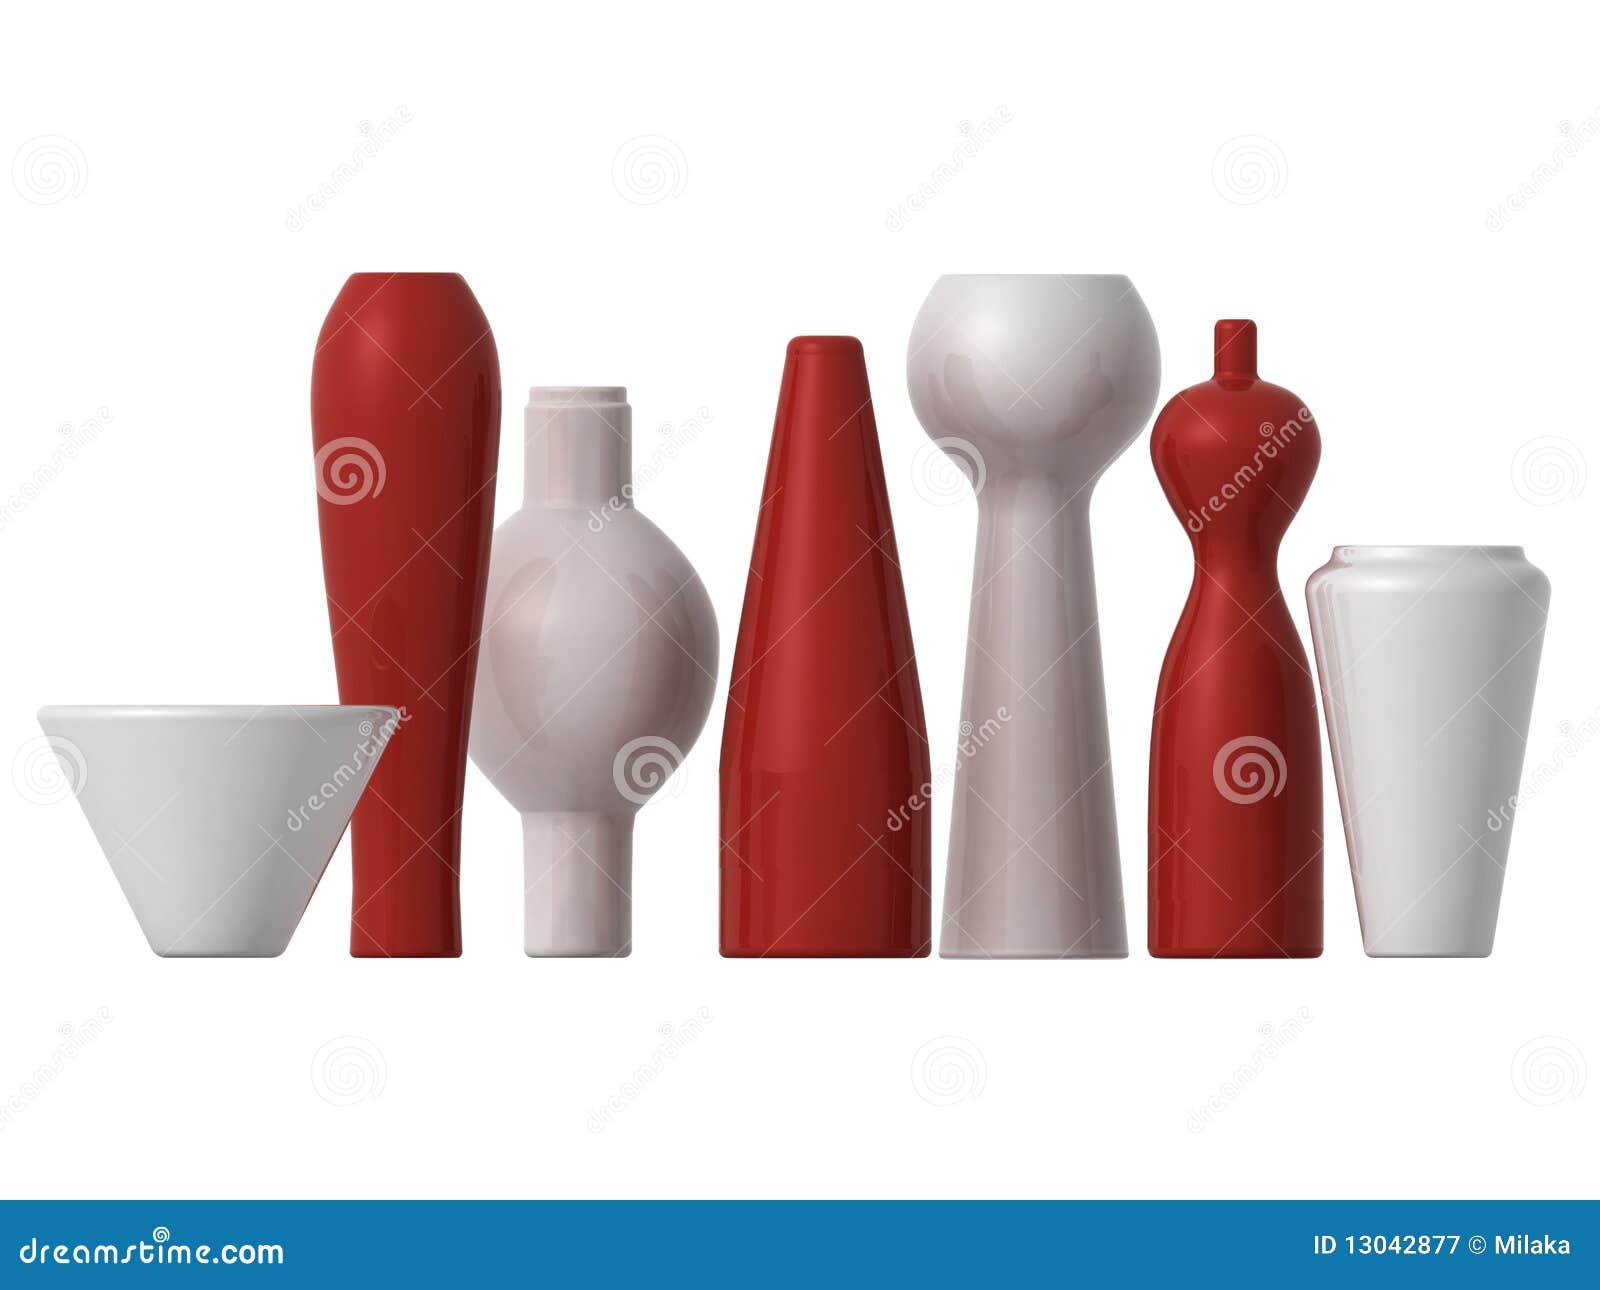 Vasi rossi e bianchi fotografia stock libera da diritti for Vasi rossi moderni